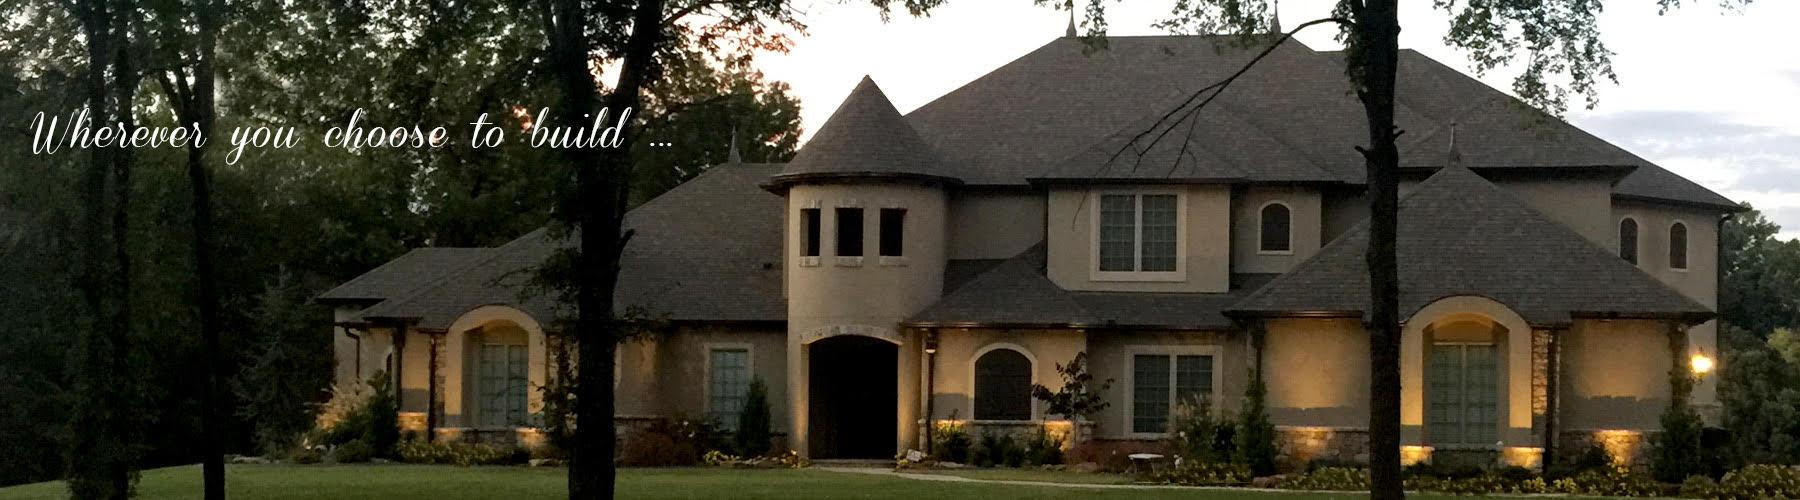 Custom homes southern homes award winning tulsa custom for Build on your lot oklahoma